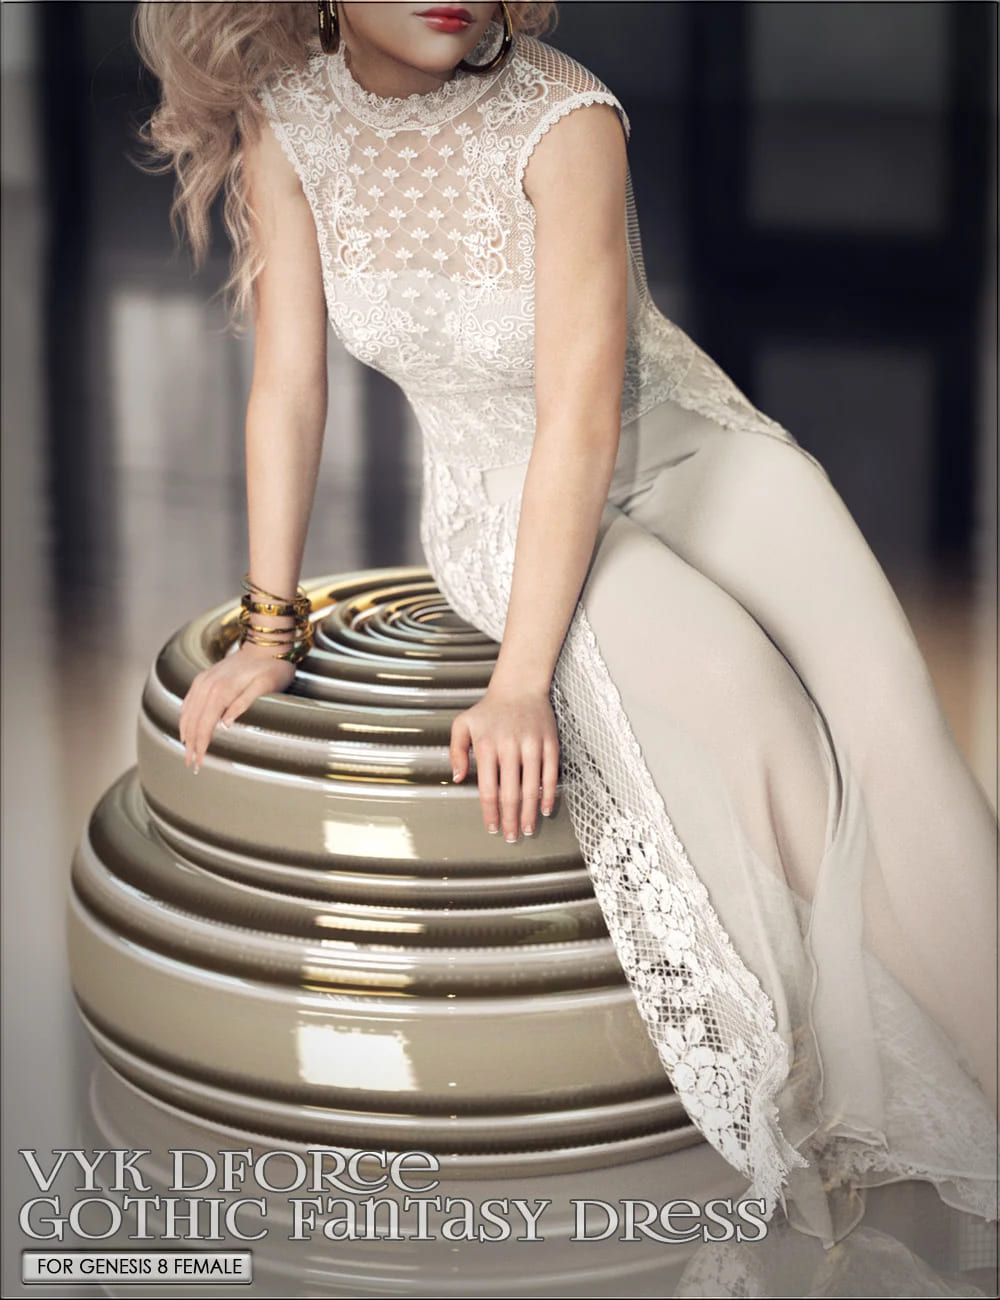 VYK dForce Gothic Fantasy Dress for Genesis 8 Females_DAZ3D下载站